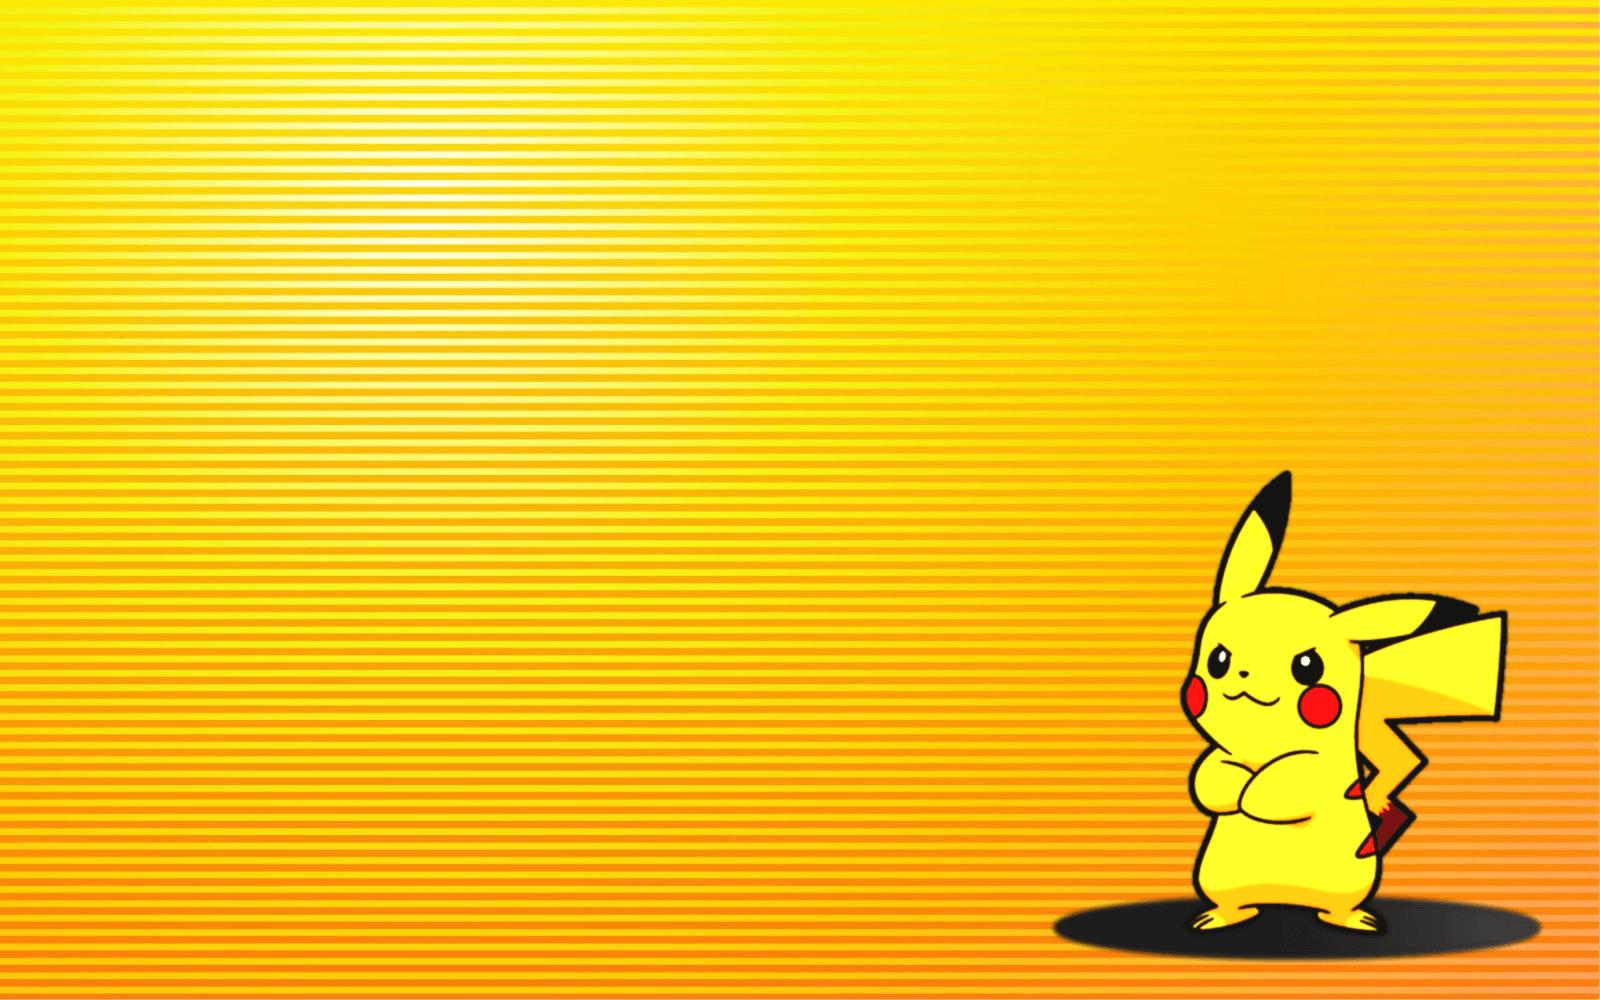 Black wallpapers 1080p wallpaper cave - Pikachu Backgrounds Wallpaper Cave